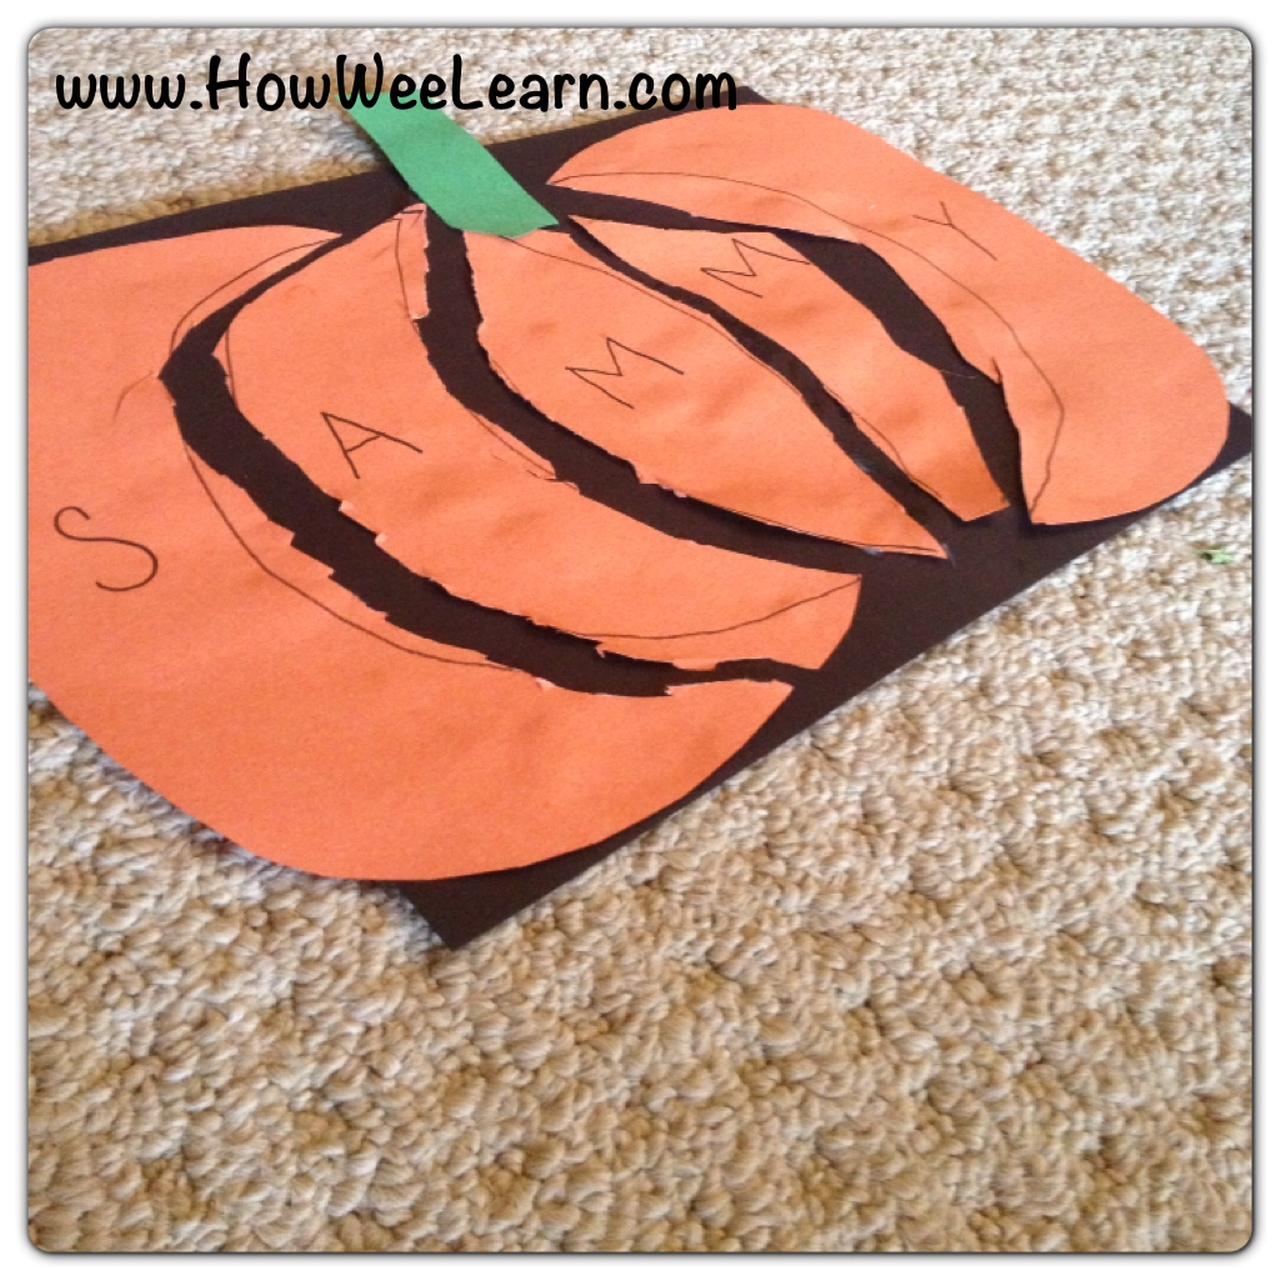 Halloween Preschool Crafts: Pumpkin Name Puzzles! - How Wee Learn